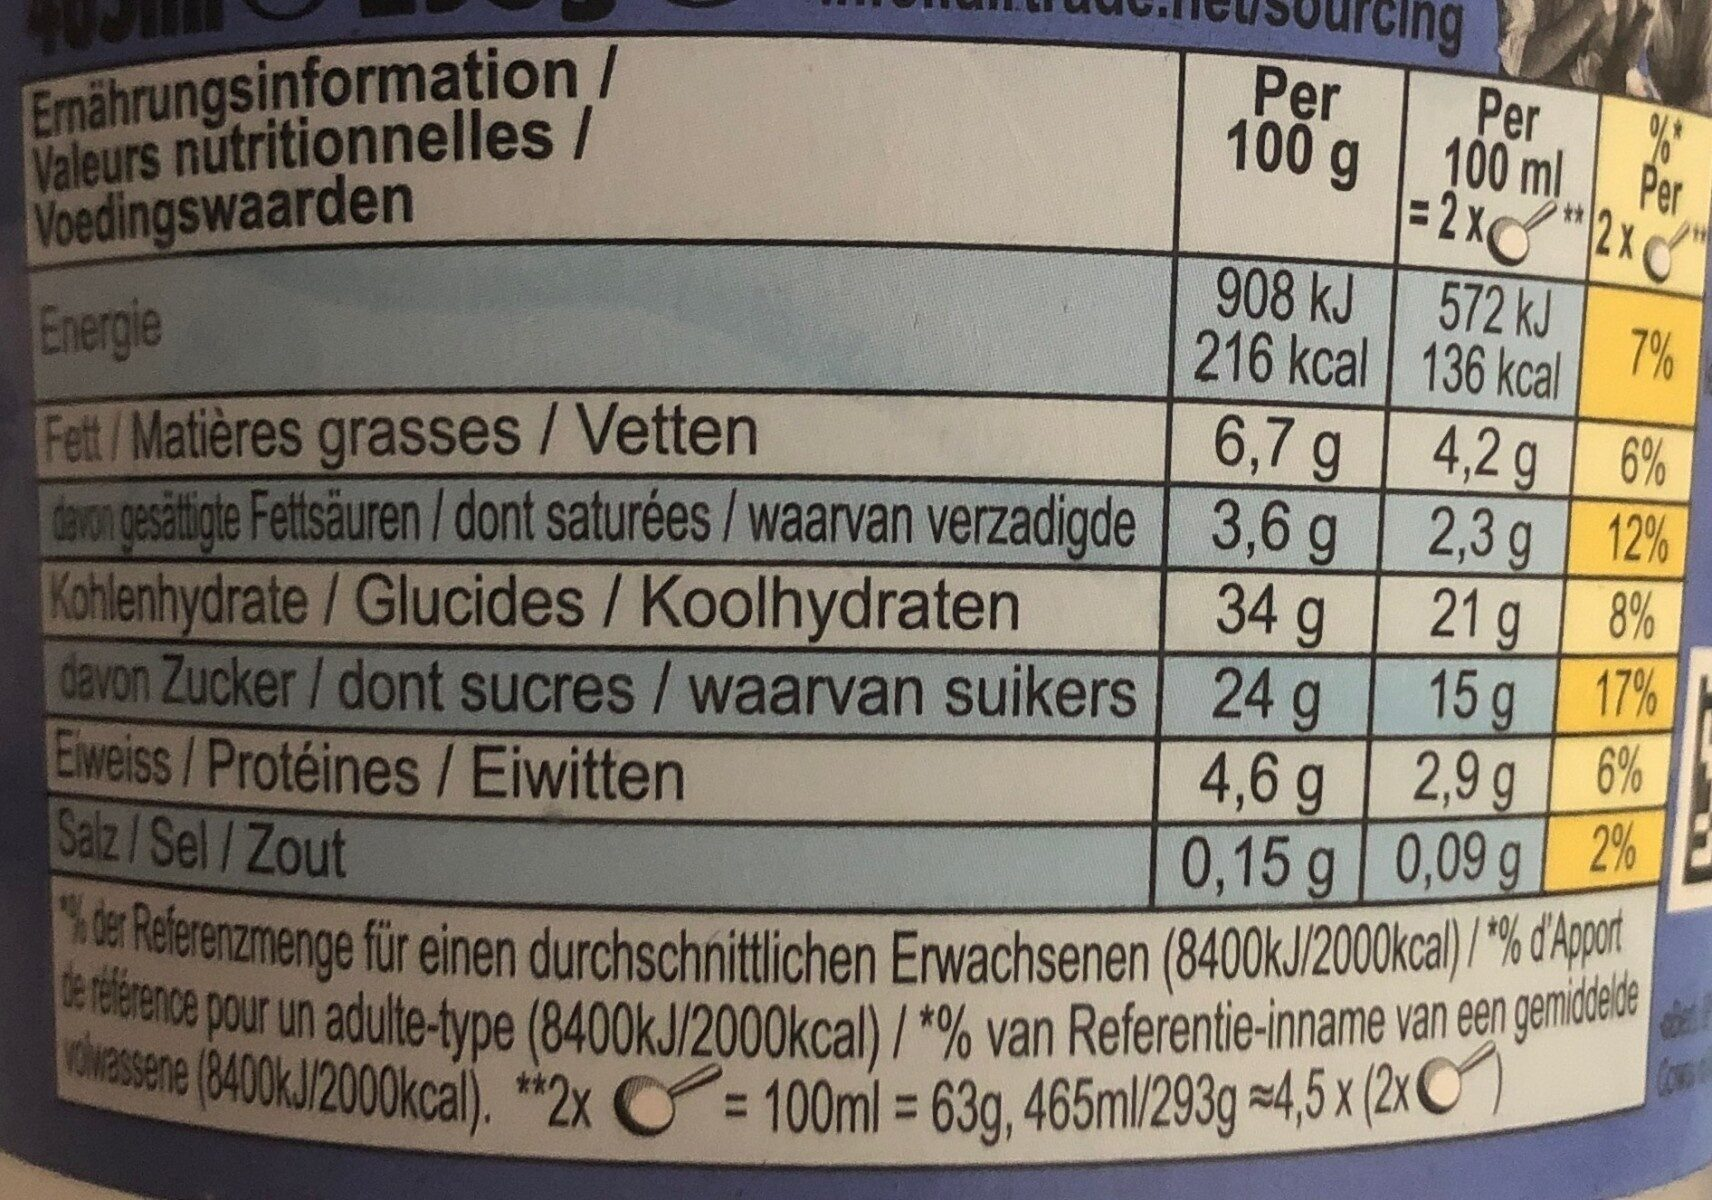 Ben & Jerry's Glace en Pot Moo-phoria™ Chocolate Cookie Dough 465ml - Nutrition facts - fr